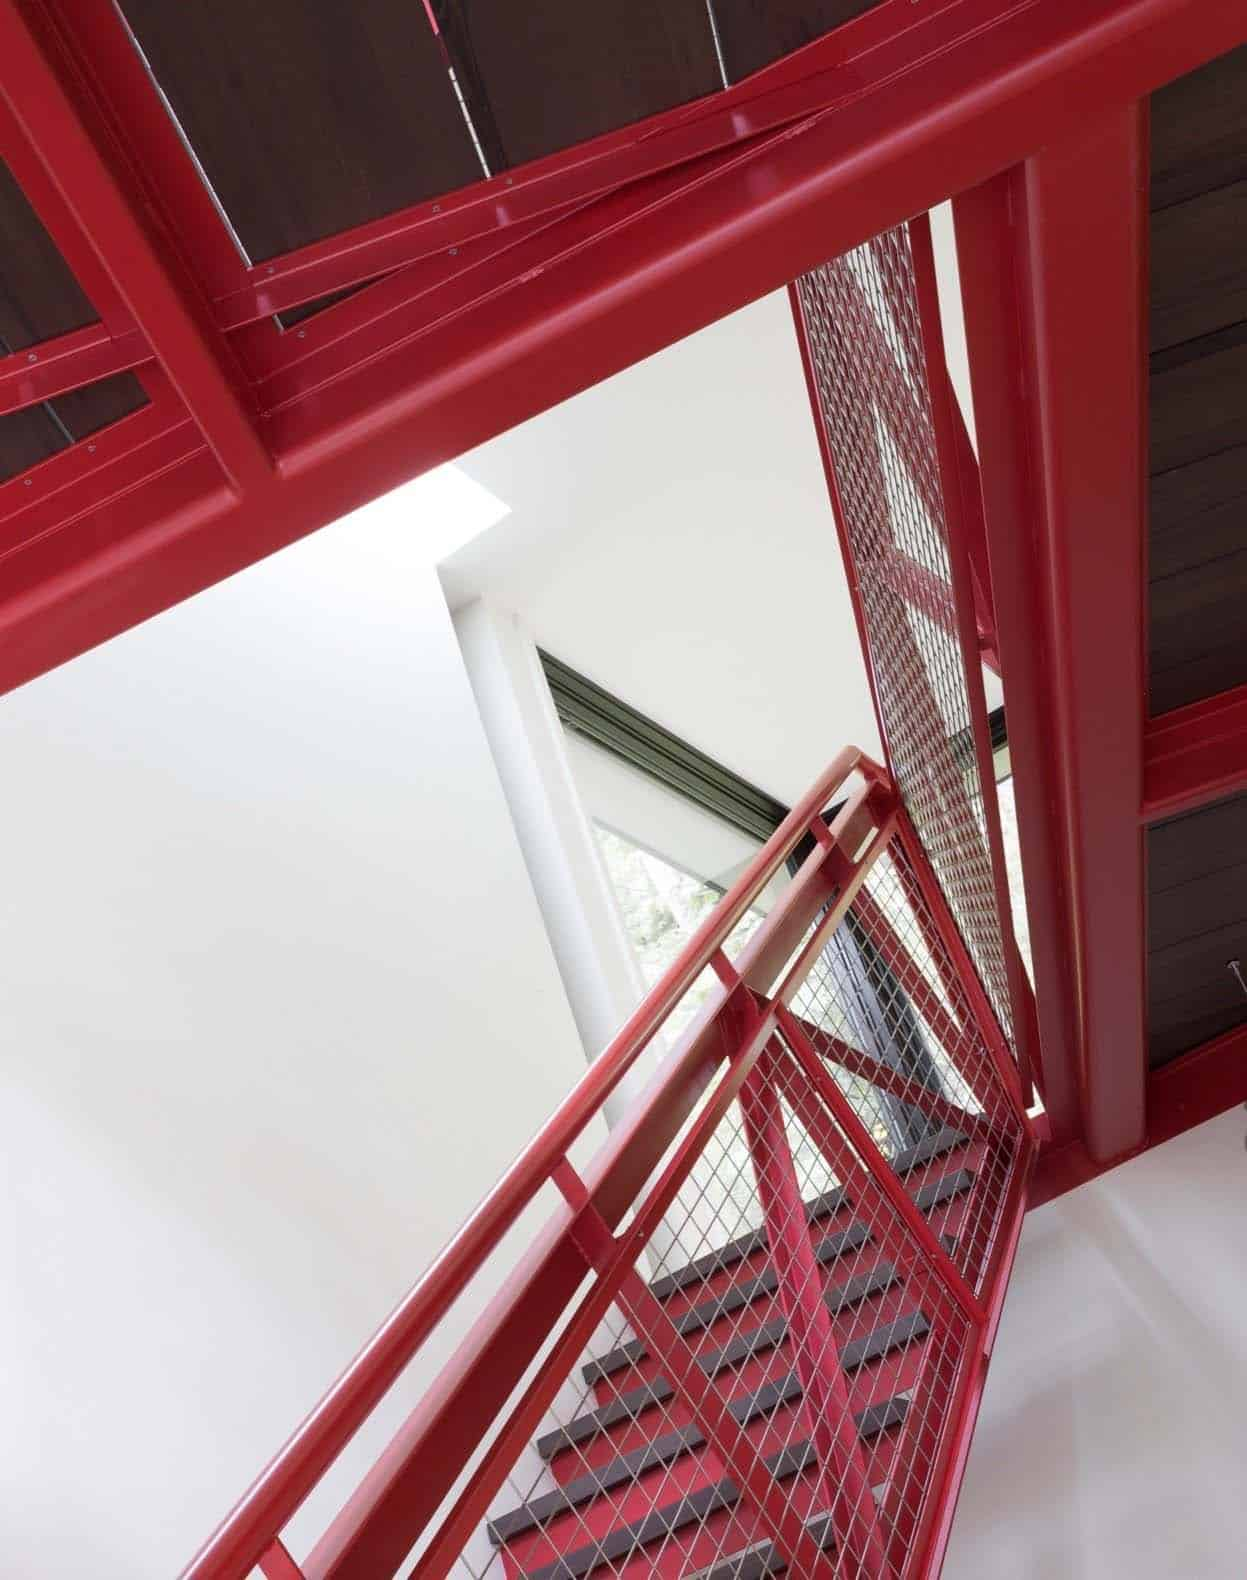 arbre-maison-escalier-moderne